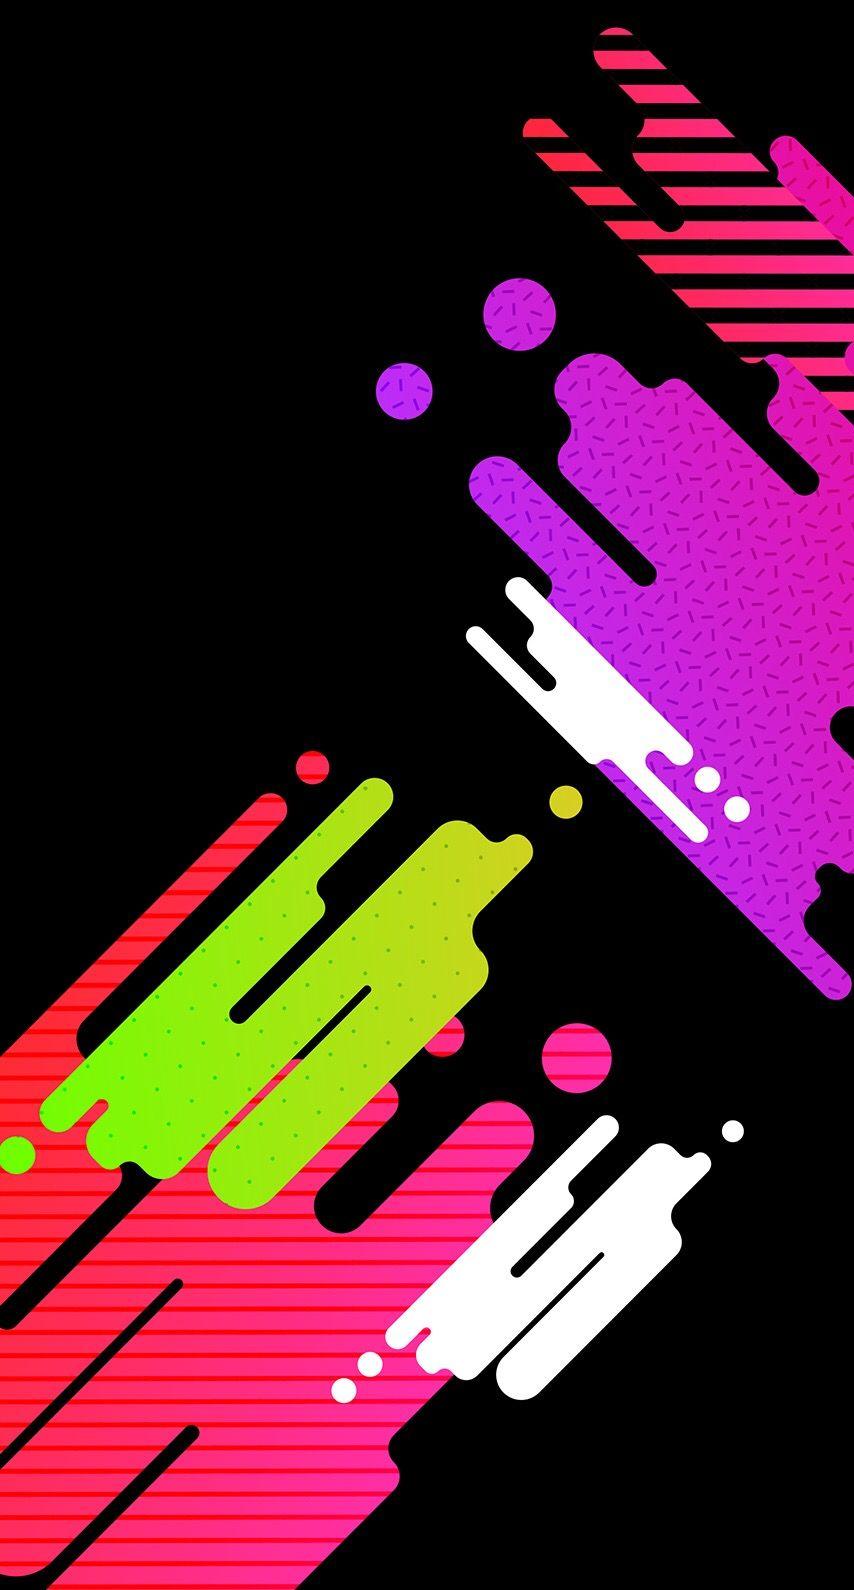 Graffiti Splash Paint Wallpaper *Abstract and Geometric